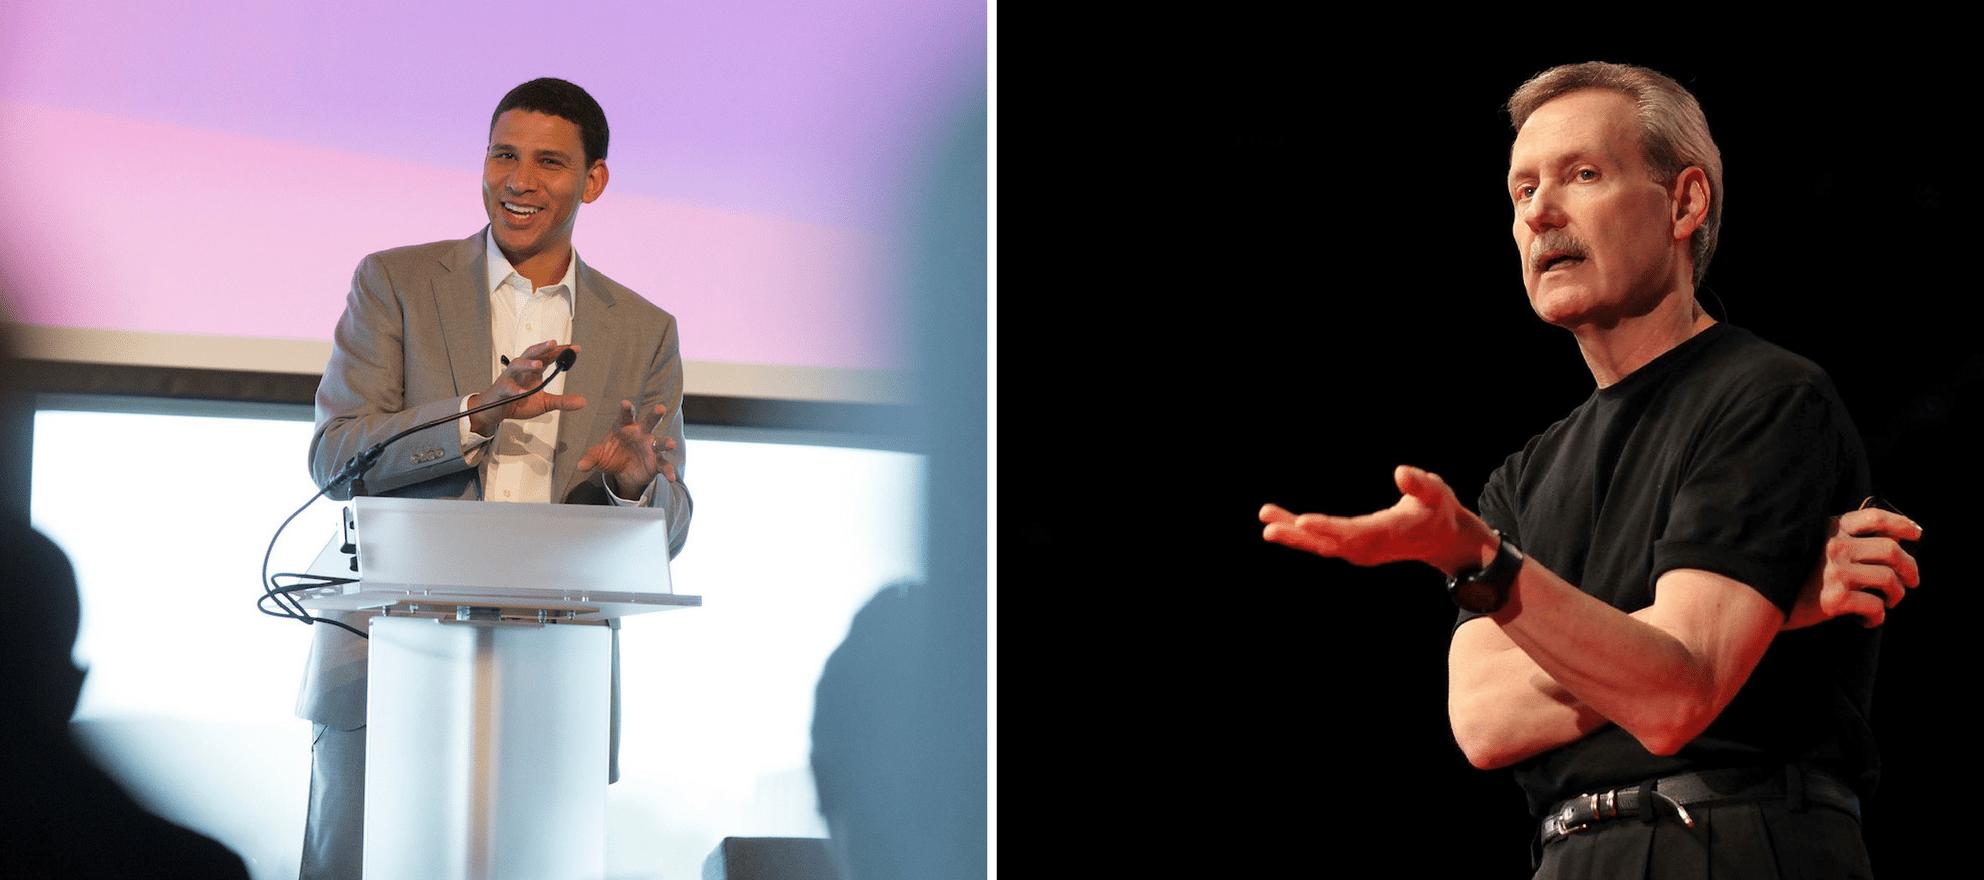 Could Gary Keller and Compass's Robert Reffkin be more similar?